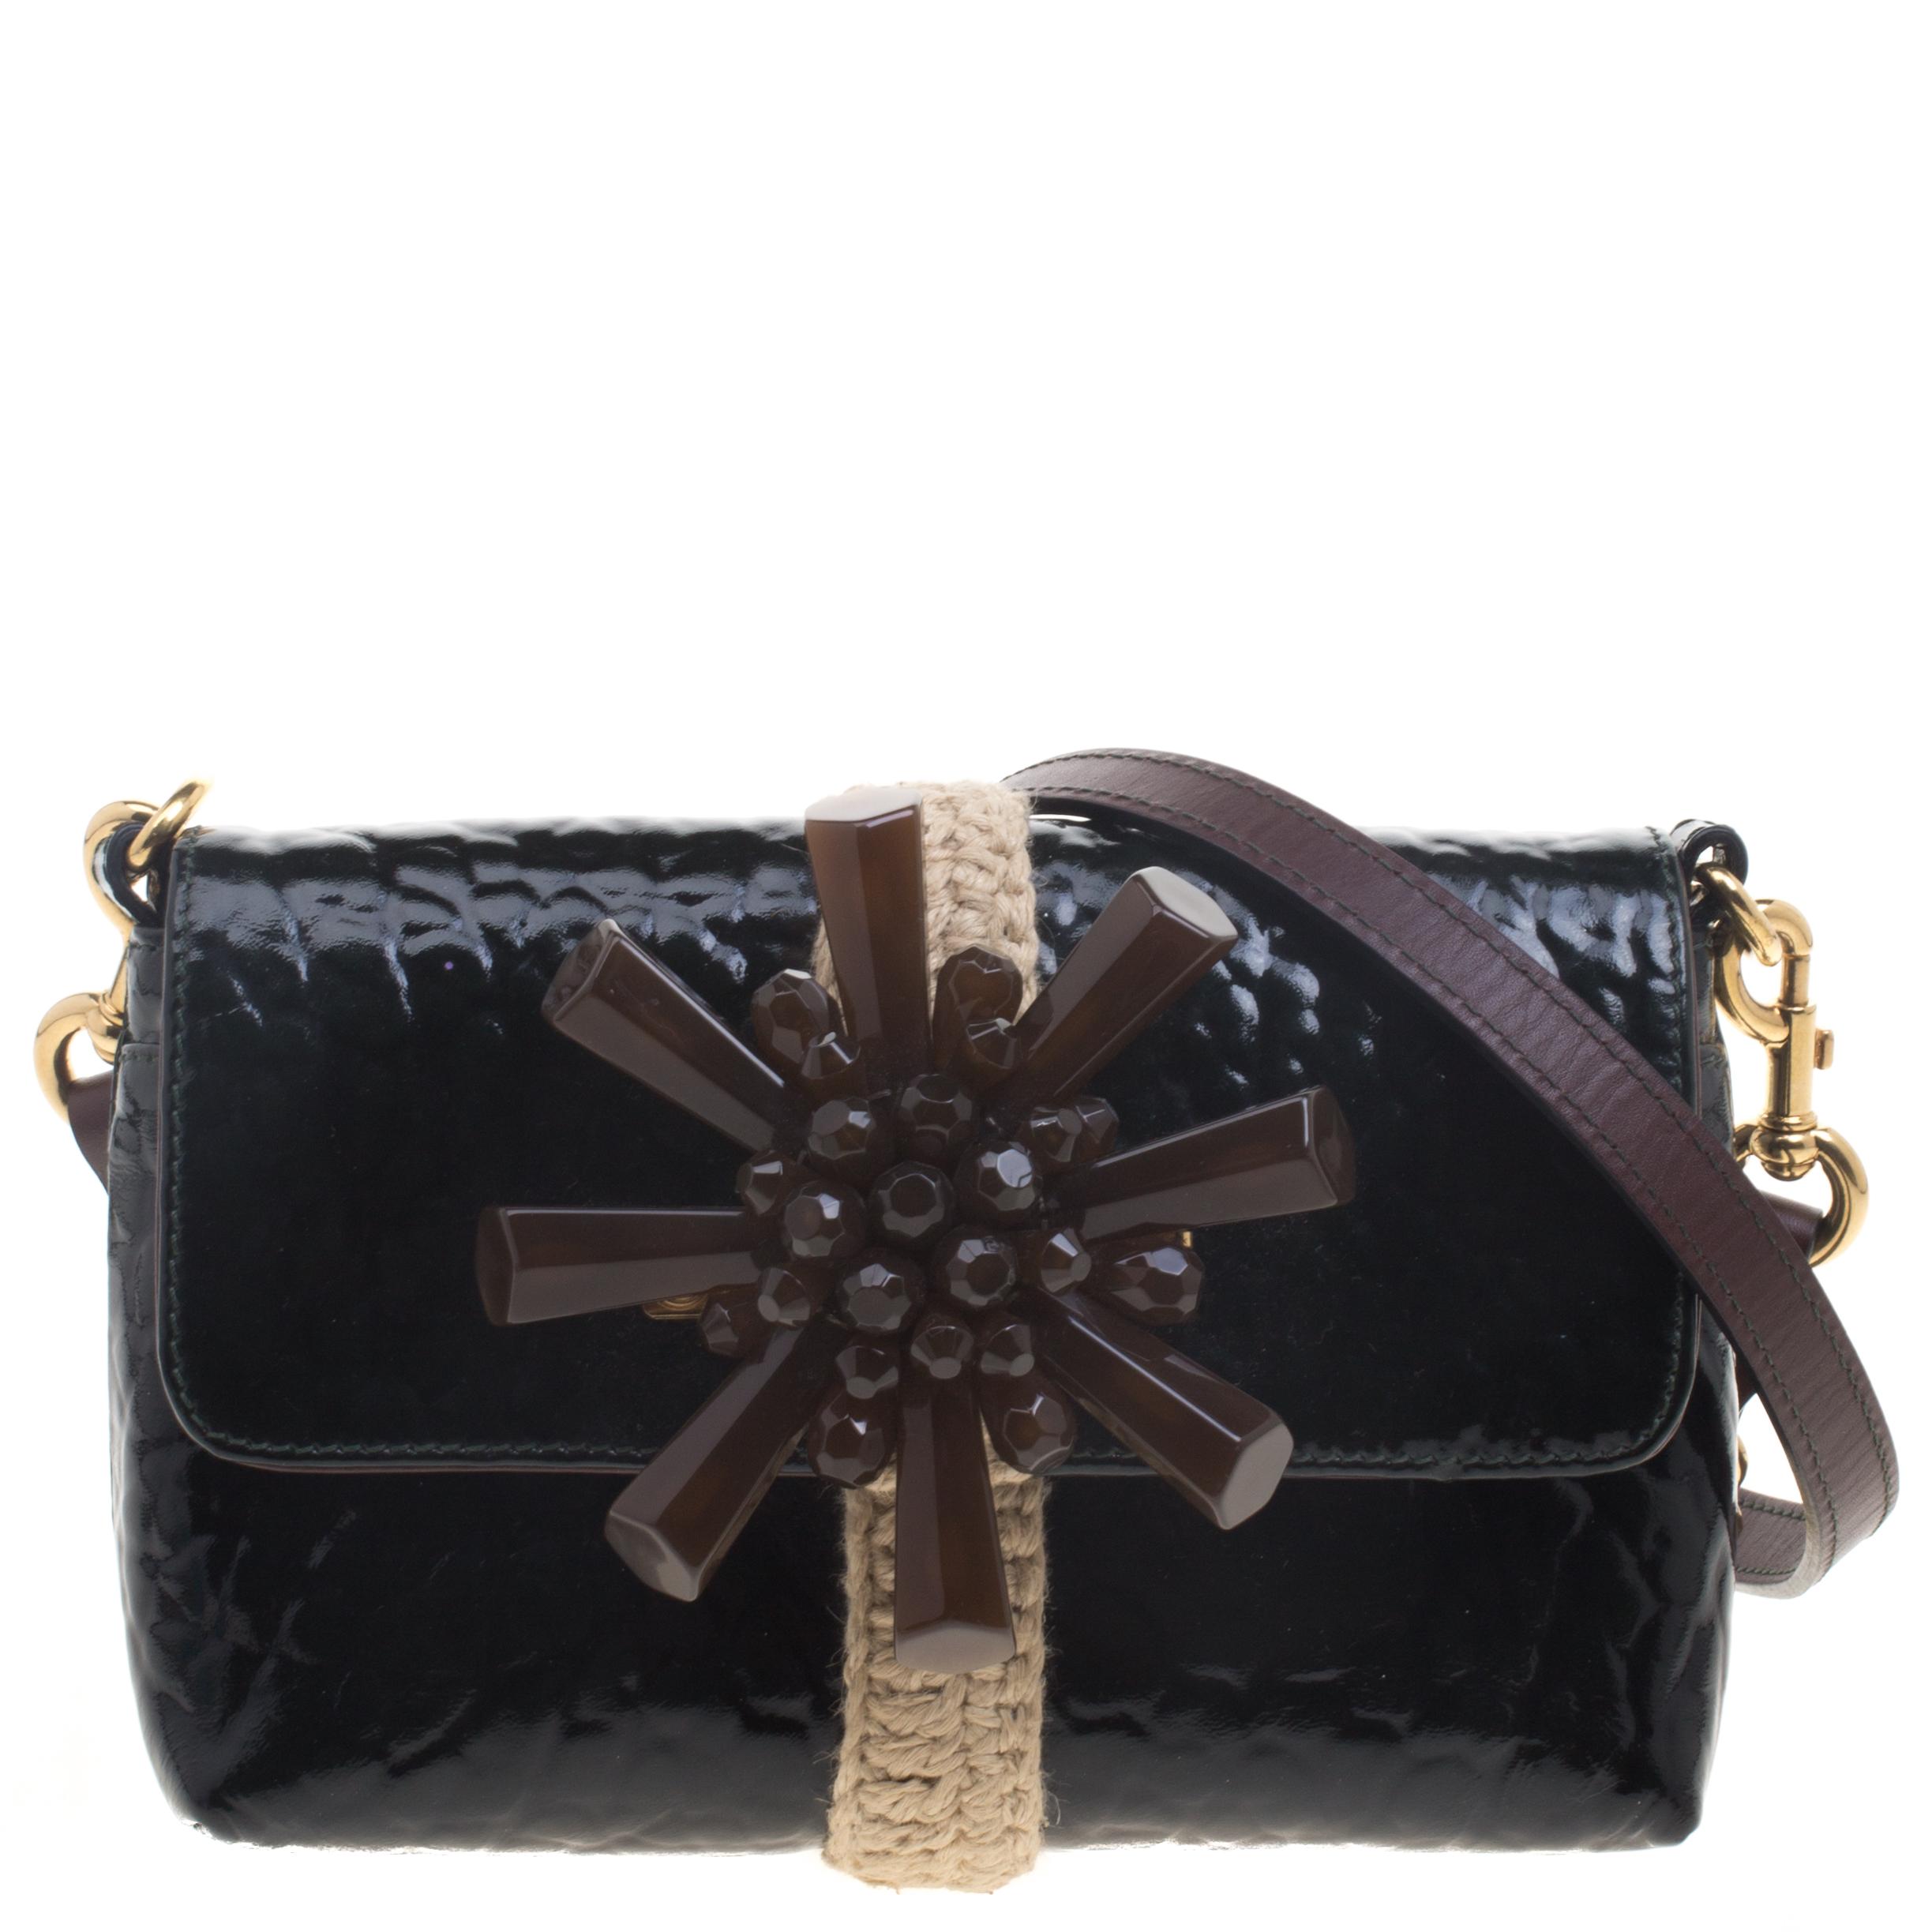 e913bd8fd86a ... Marc Jacobs Dark Green Patent Leather Embellished Crossbody Bag.  nextprev. prevnext